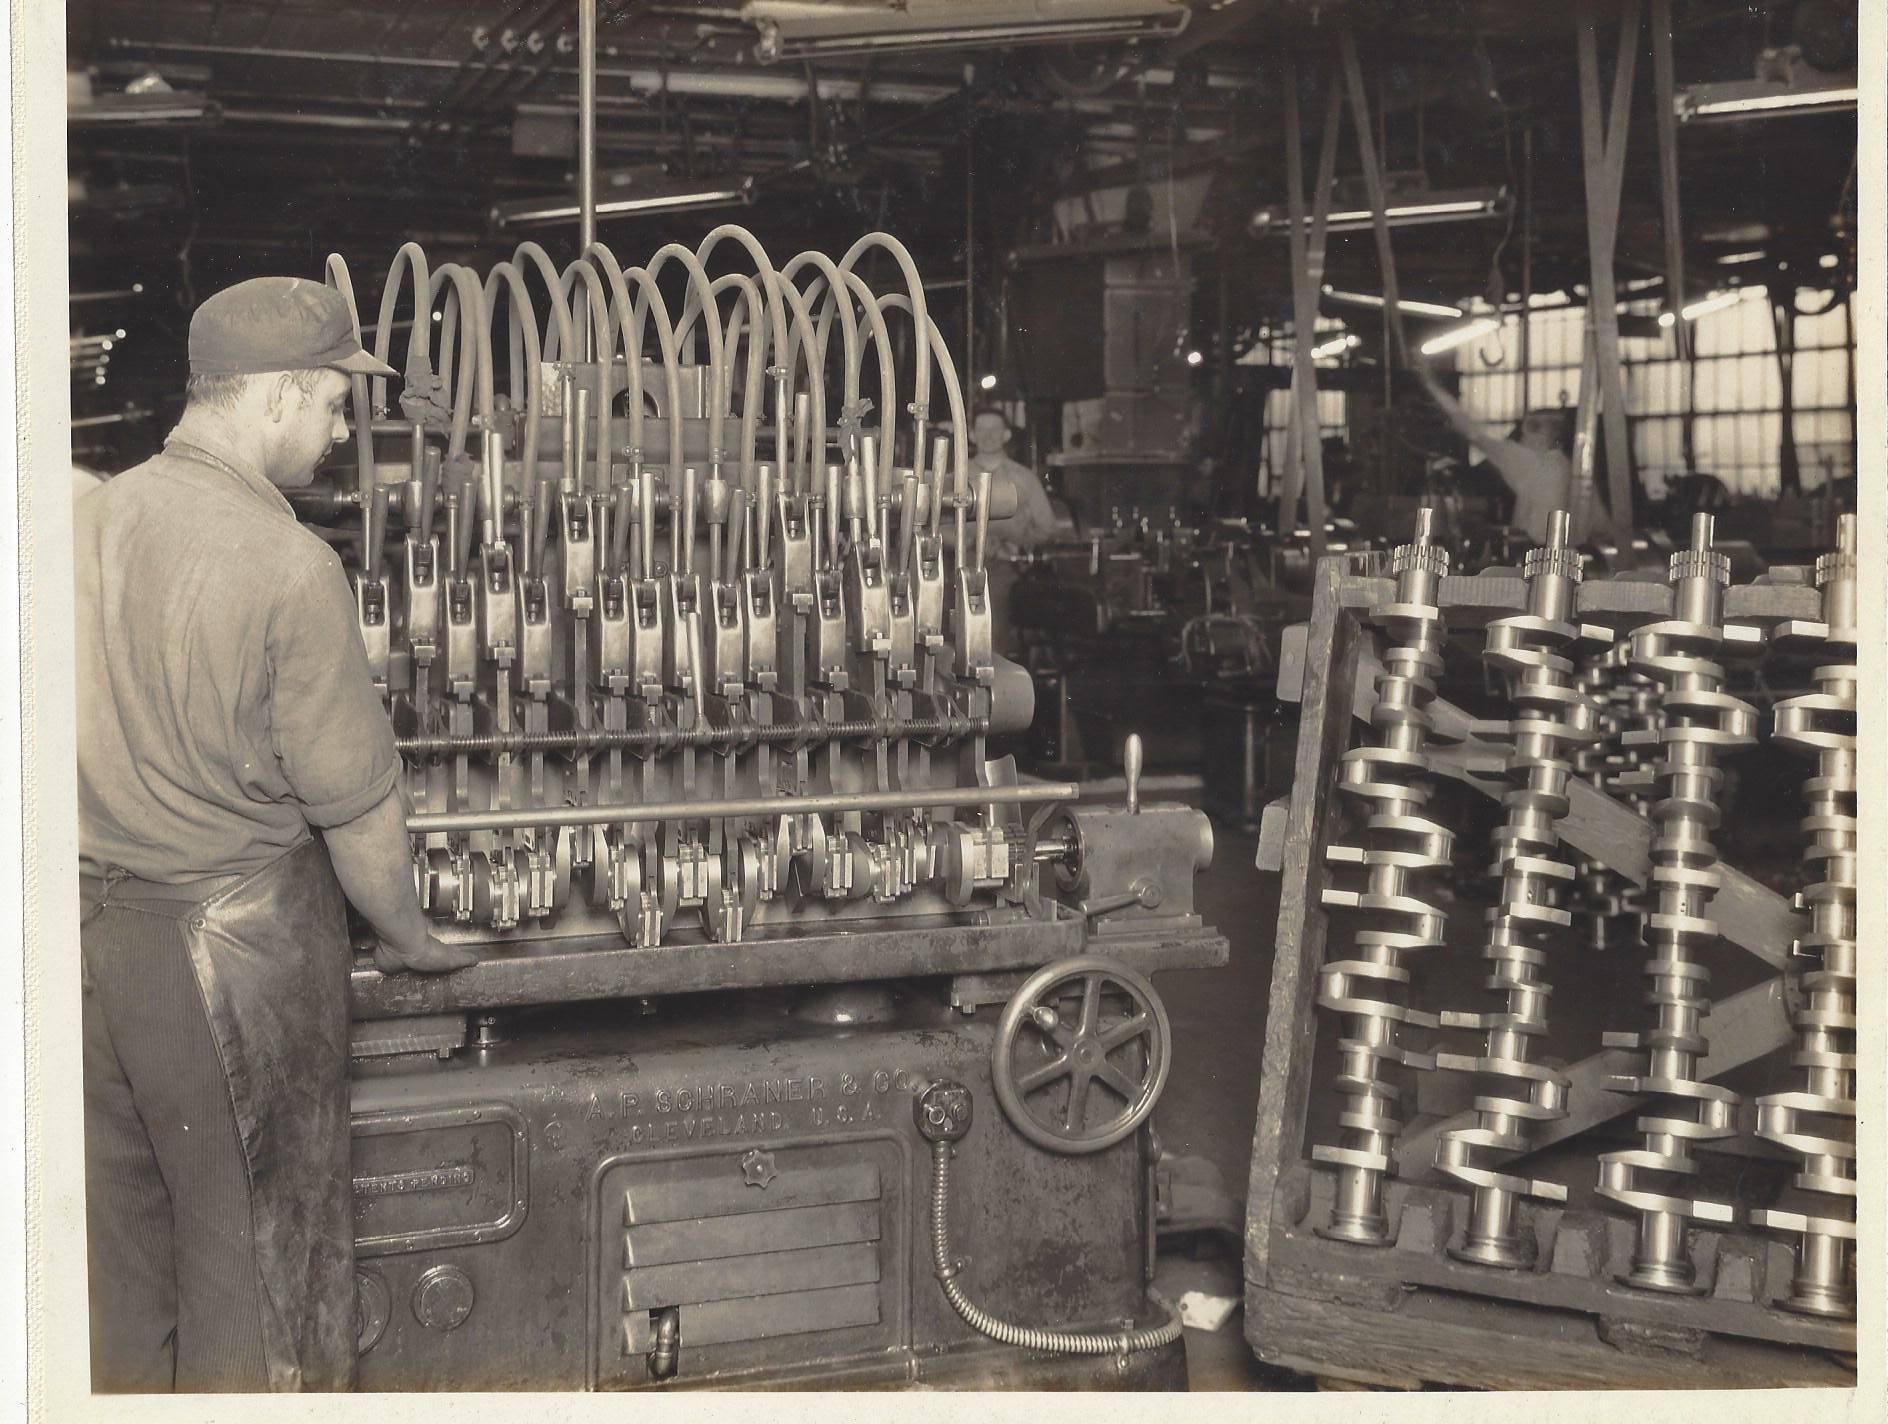 CRANKSHAFT HONING MACHINE - 2777-A